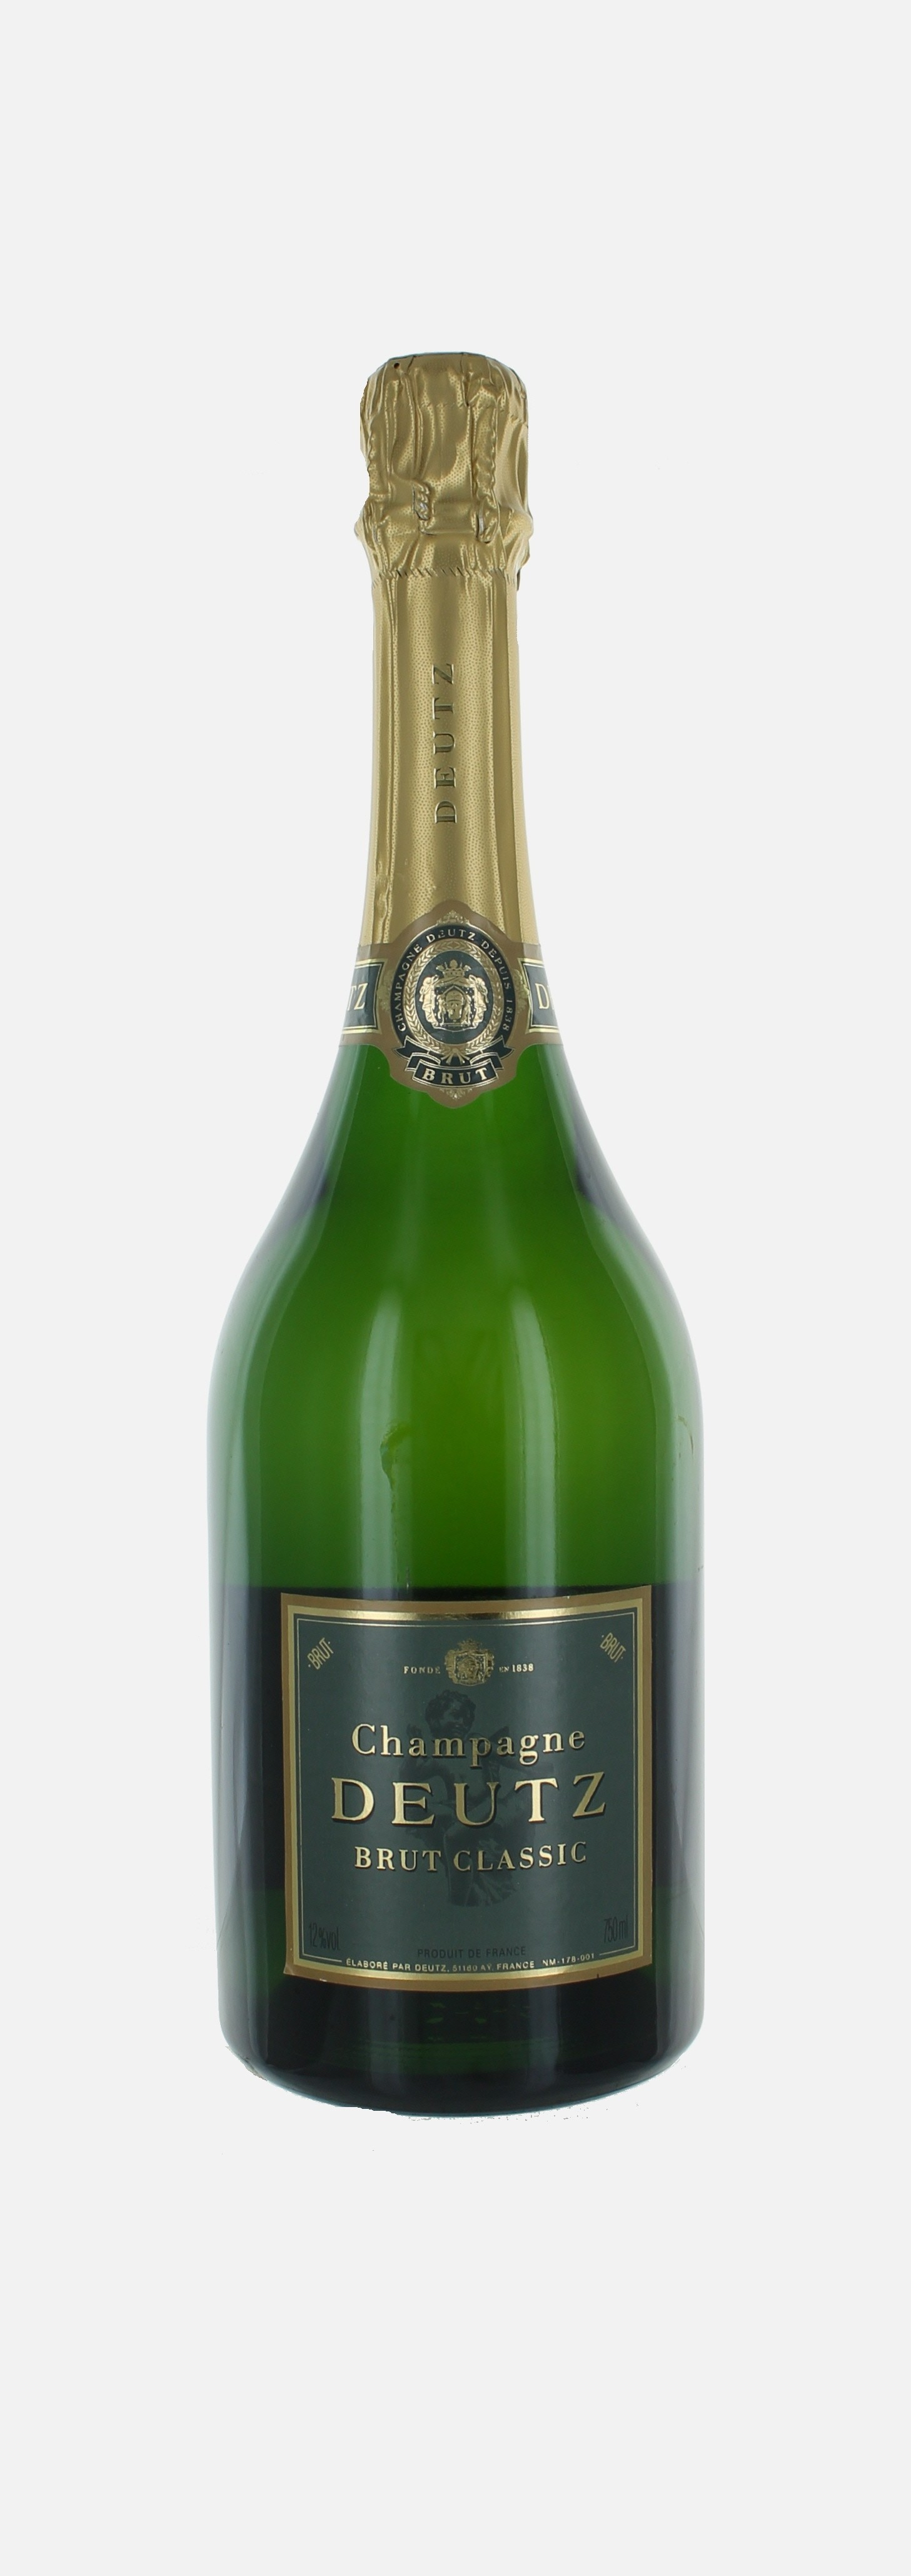 Deutz Brut Classic, Champagne